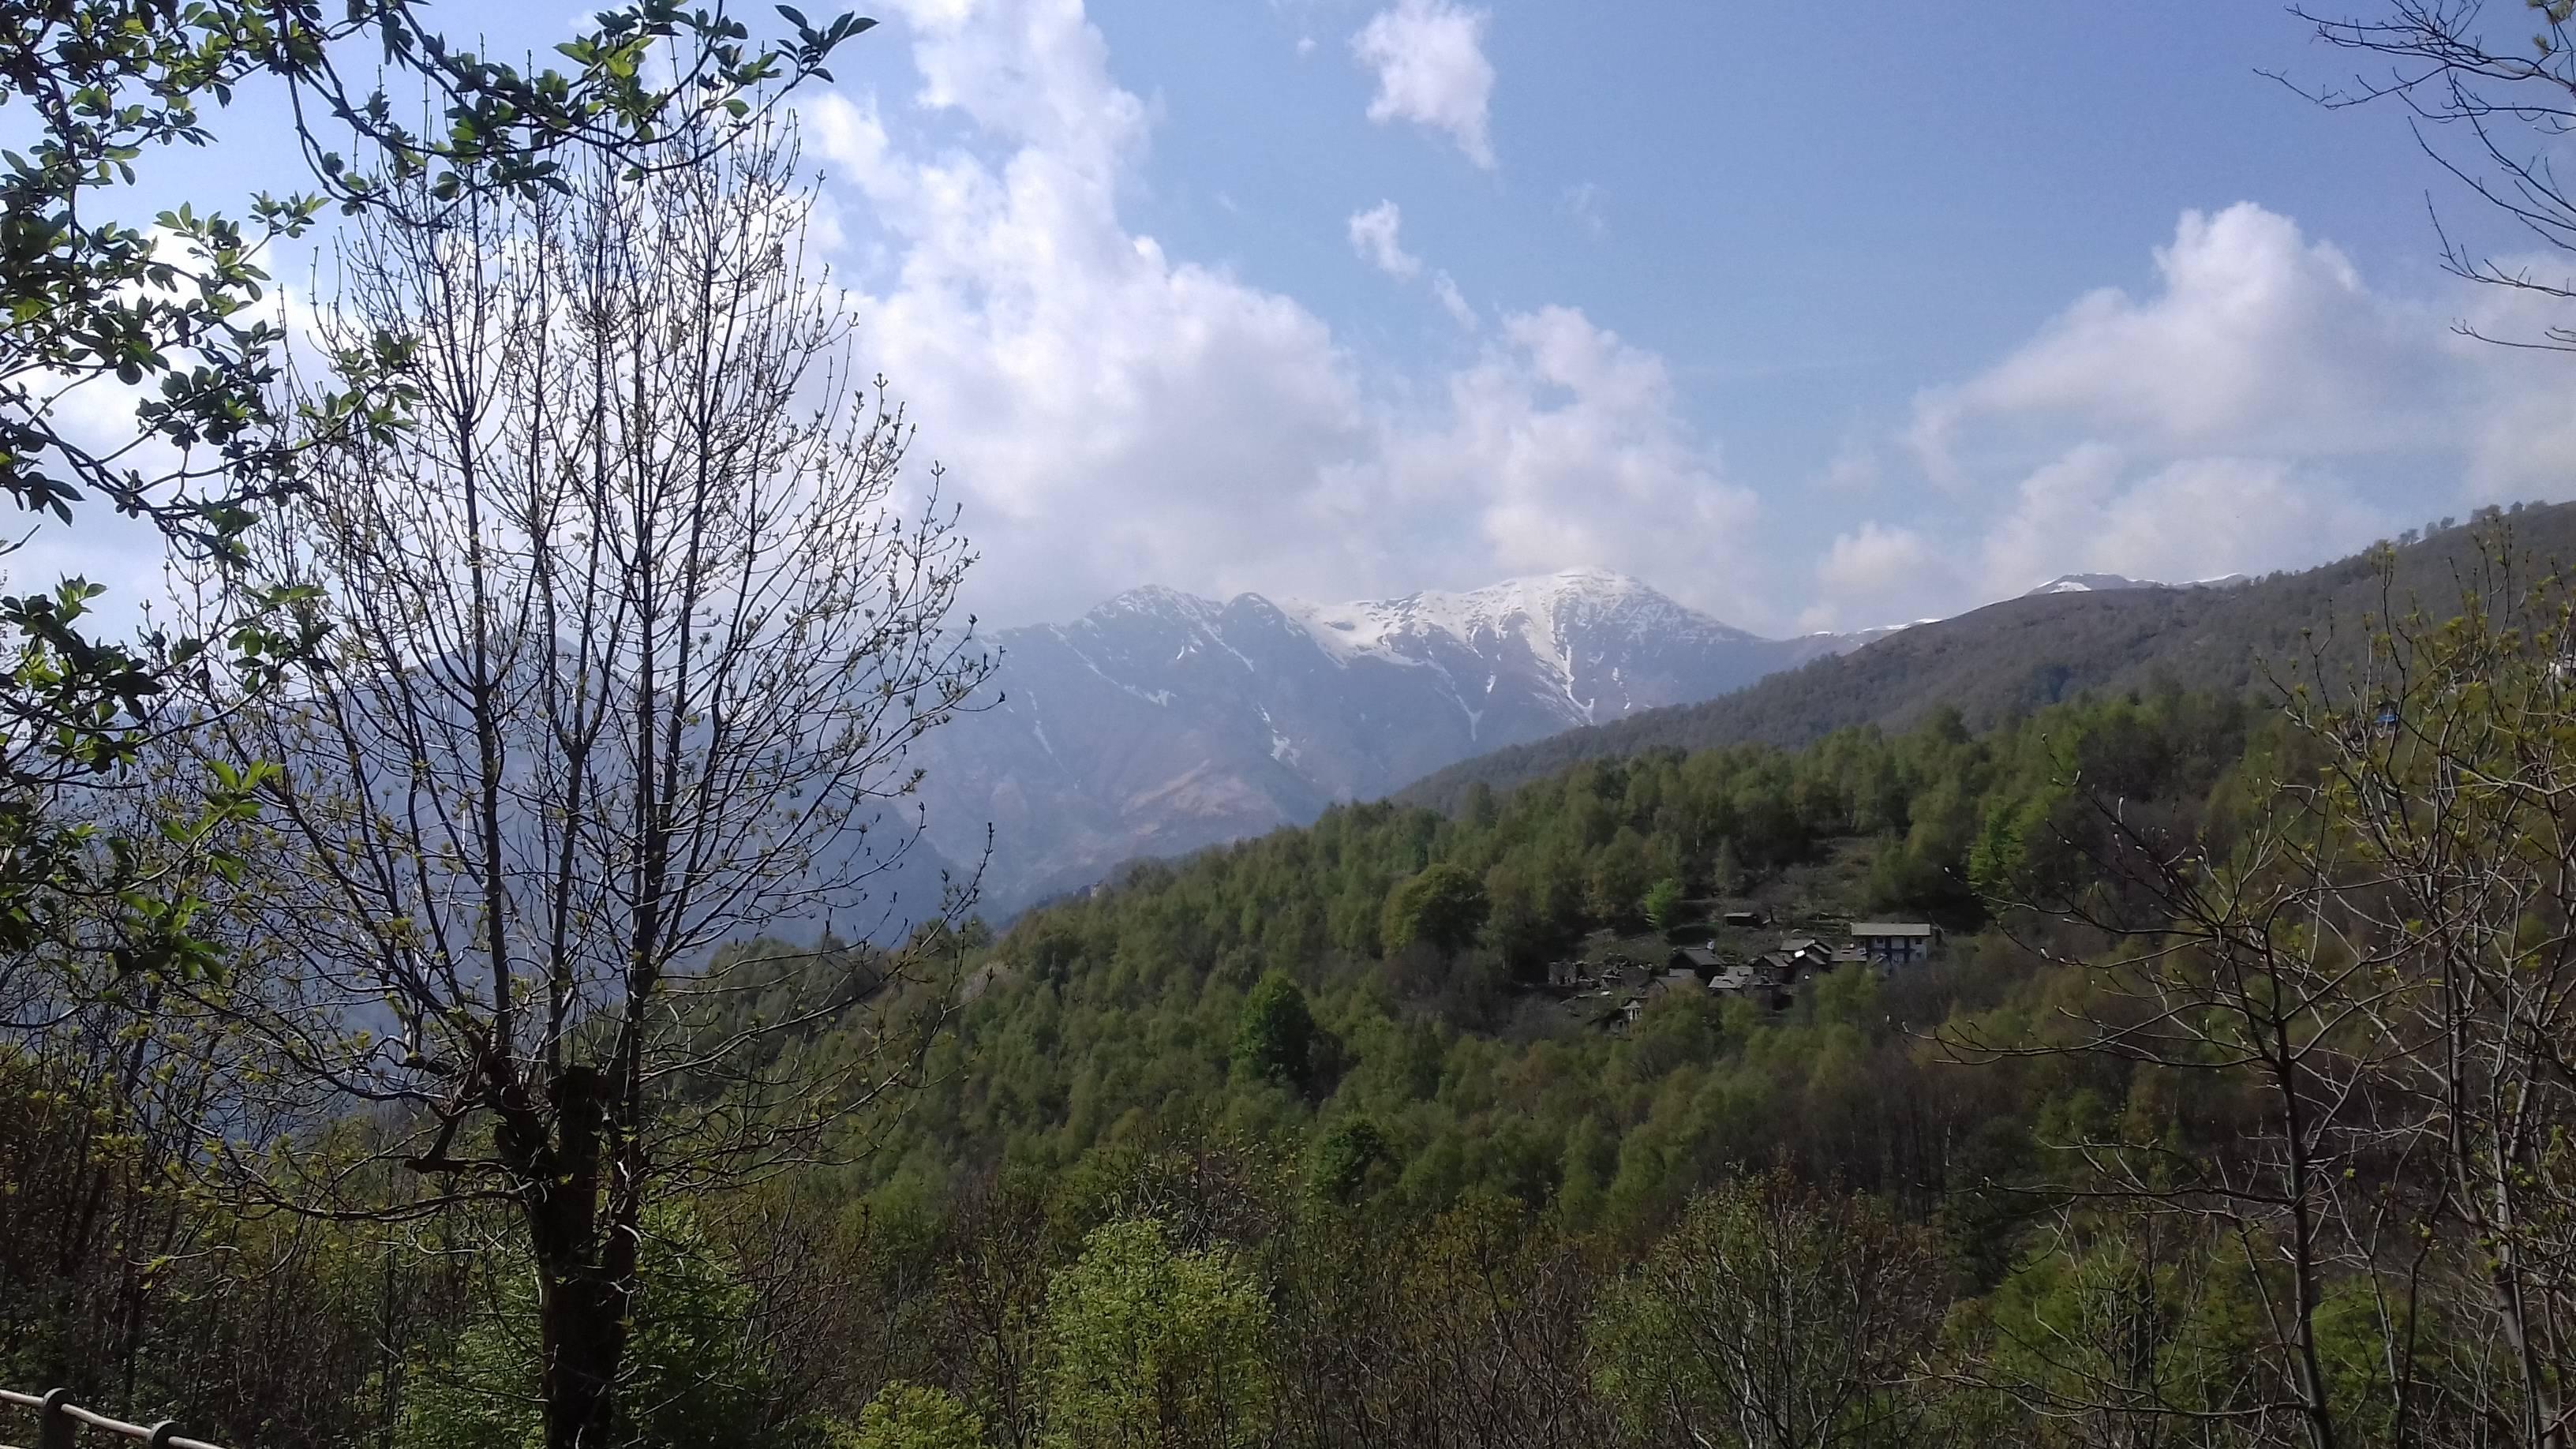 Vista dal sentiero nel bosco nelle vicinanze della casa/View from a path in the wood in the neighborhood of our house